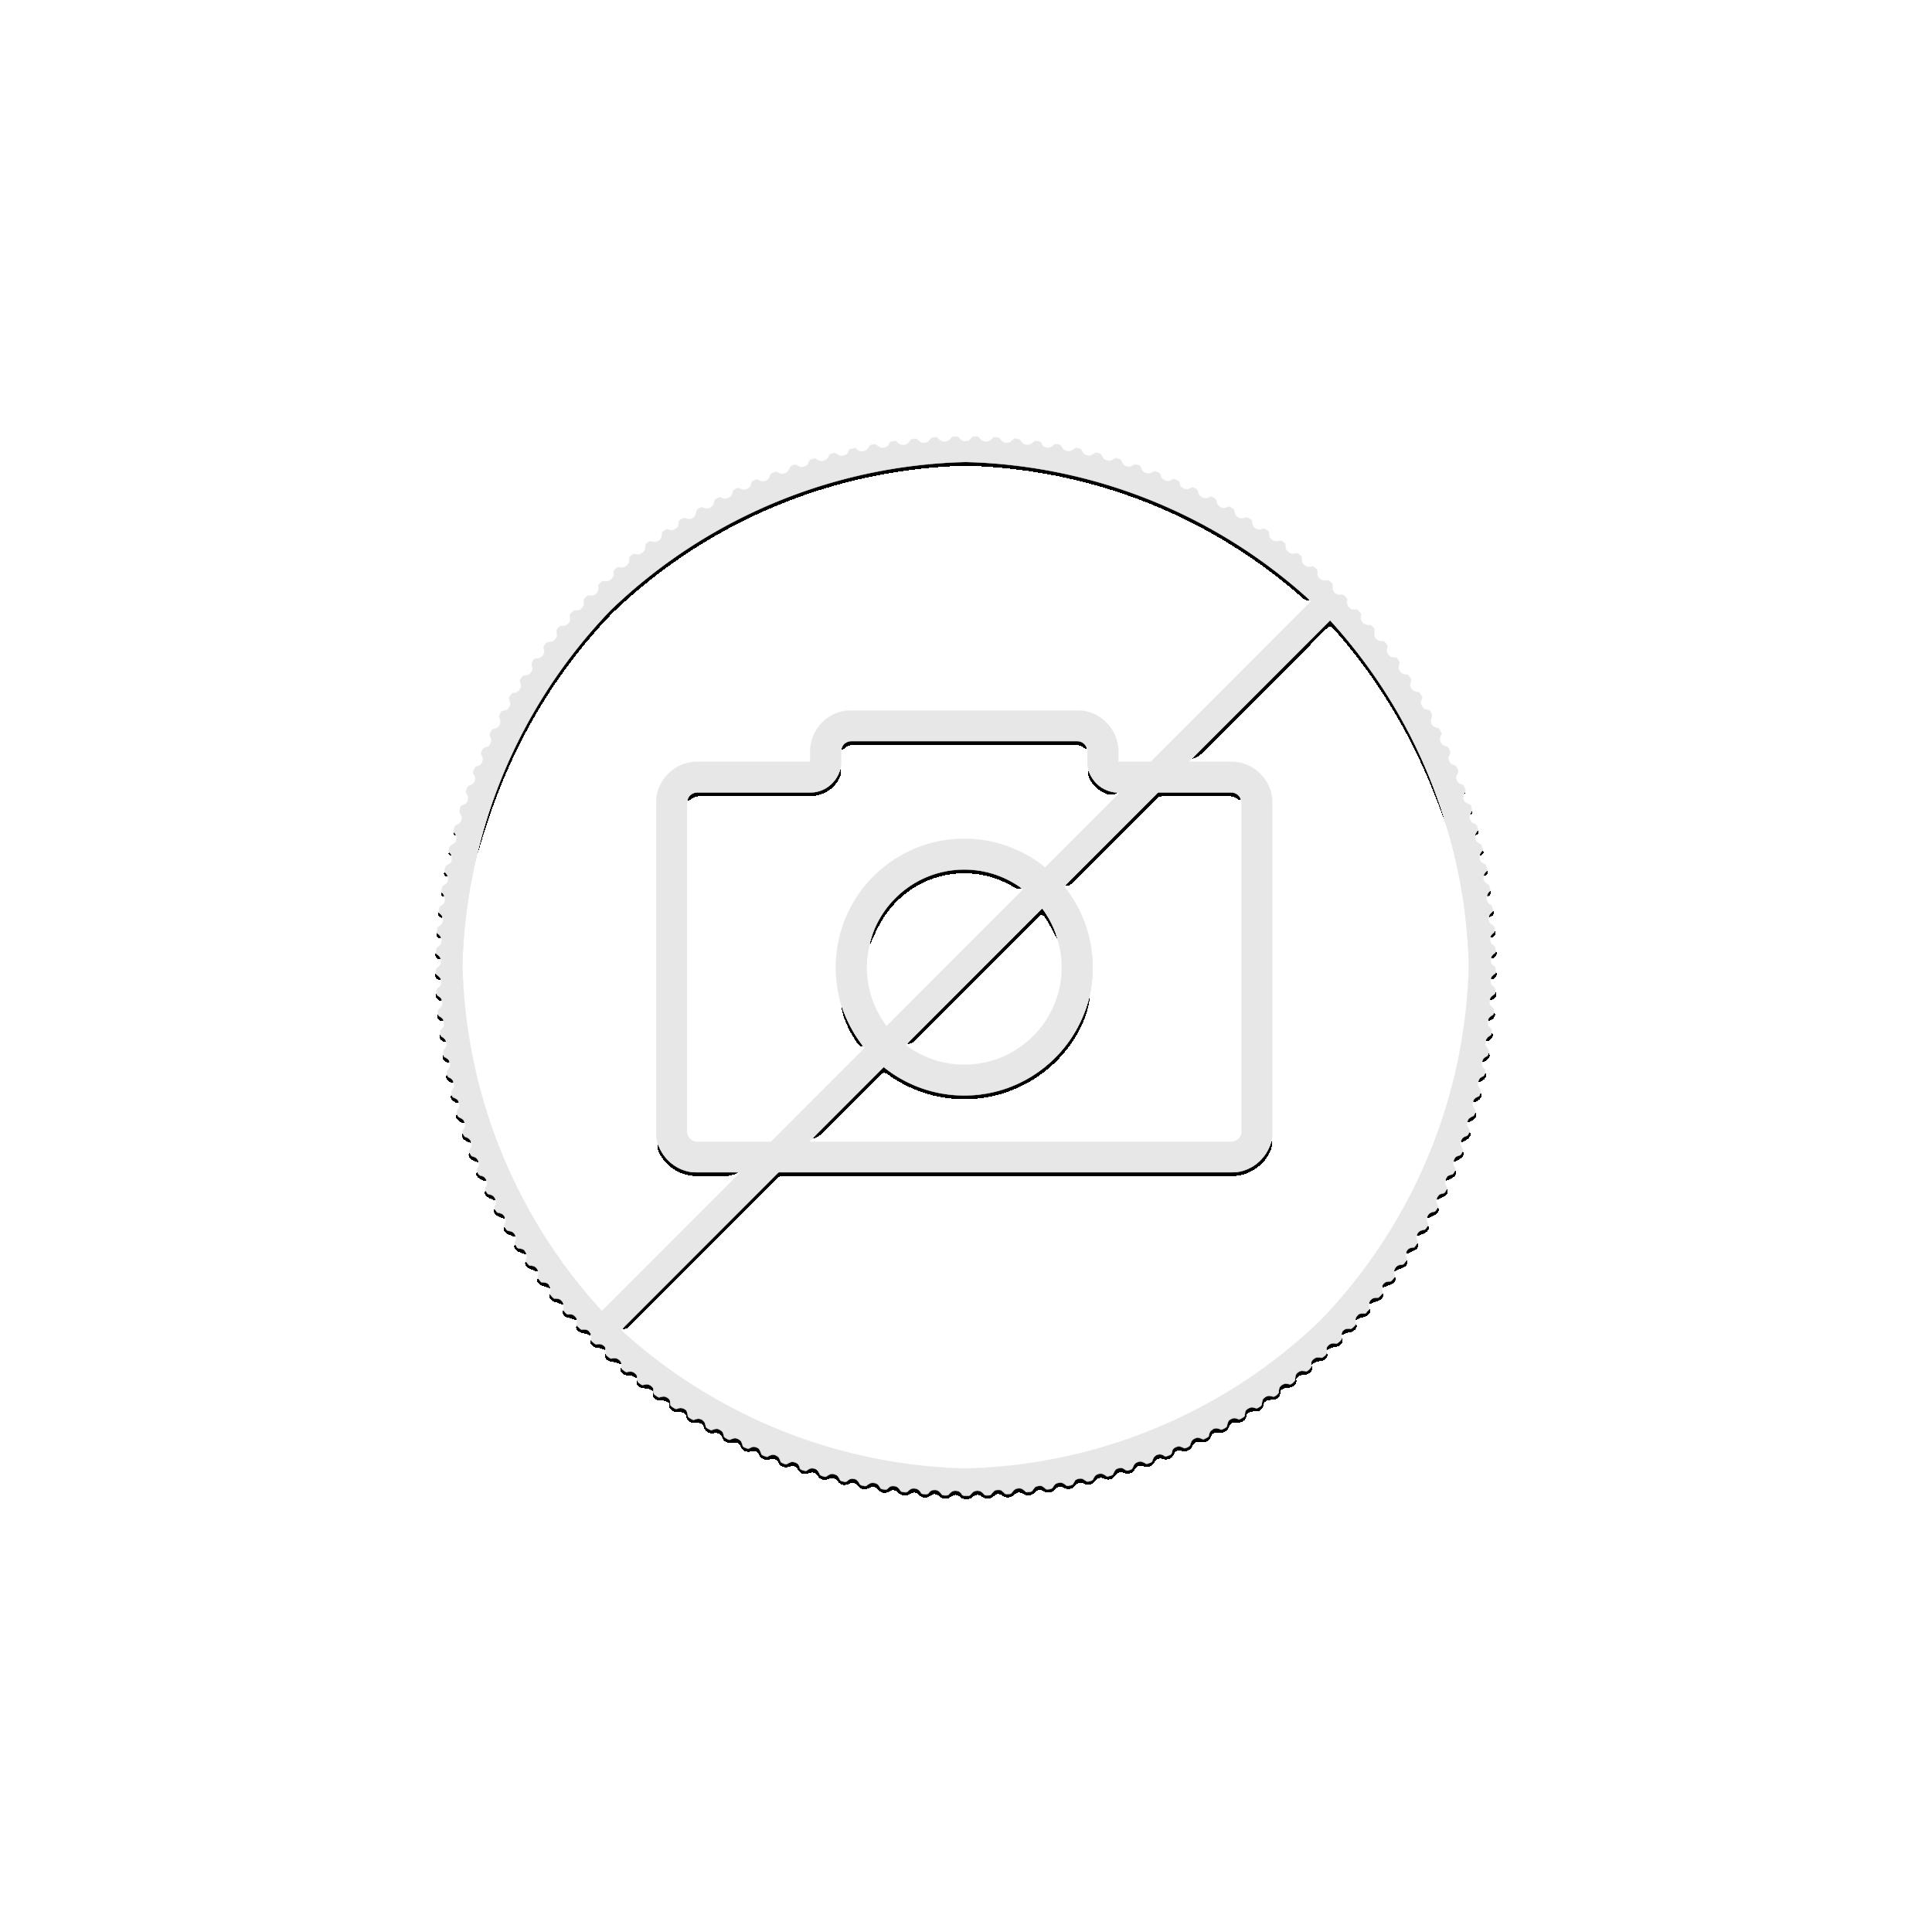 1/2 troy ounce zilver Lunar munt 2012